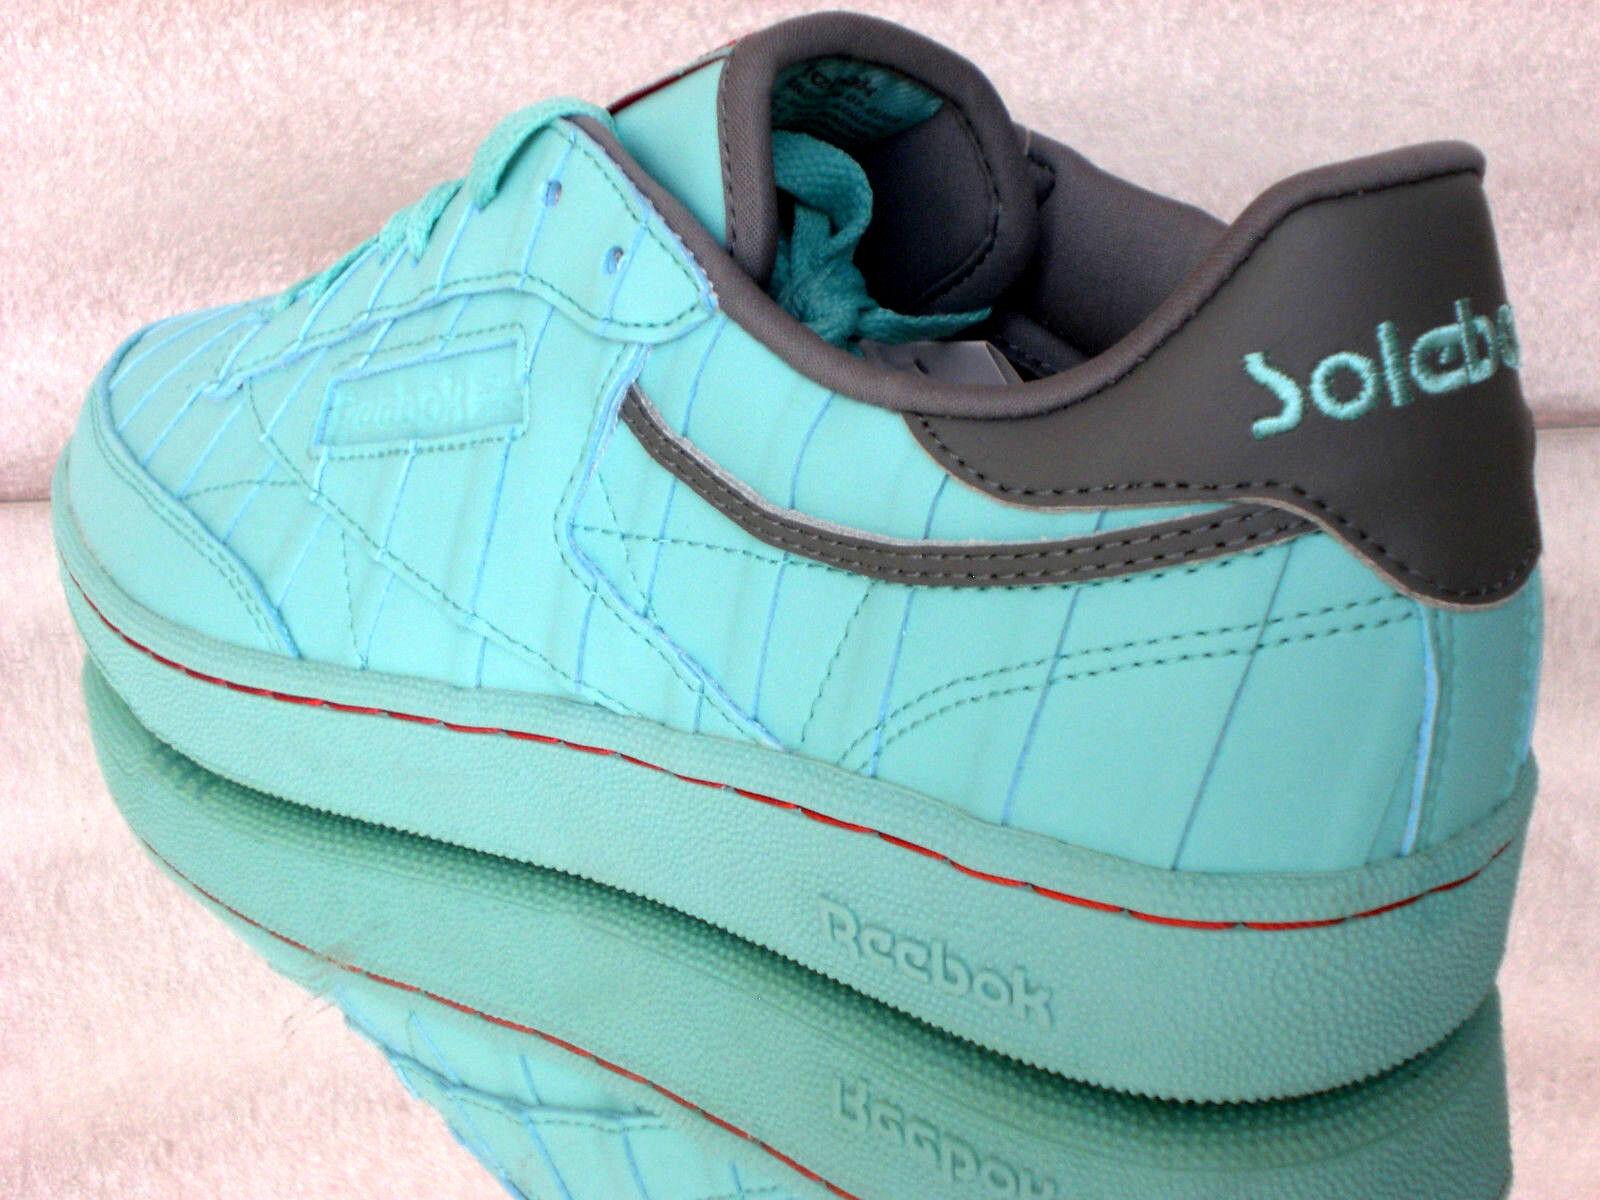 Reebok /cylone Club C CNx Solebox AR 3618 Aqua vapor /cylone Reebok Grau TennisShuh Sneaker Neu 517985